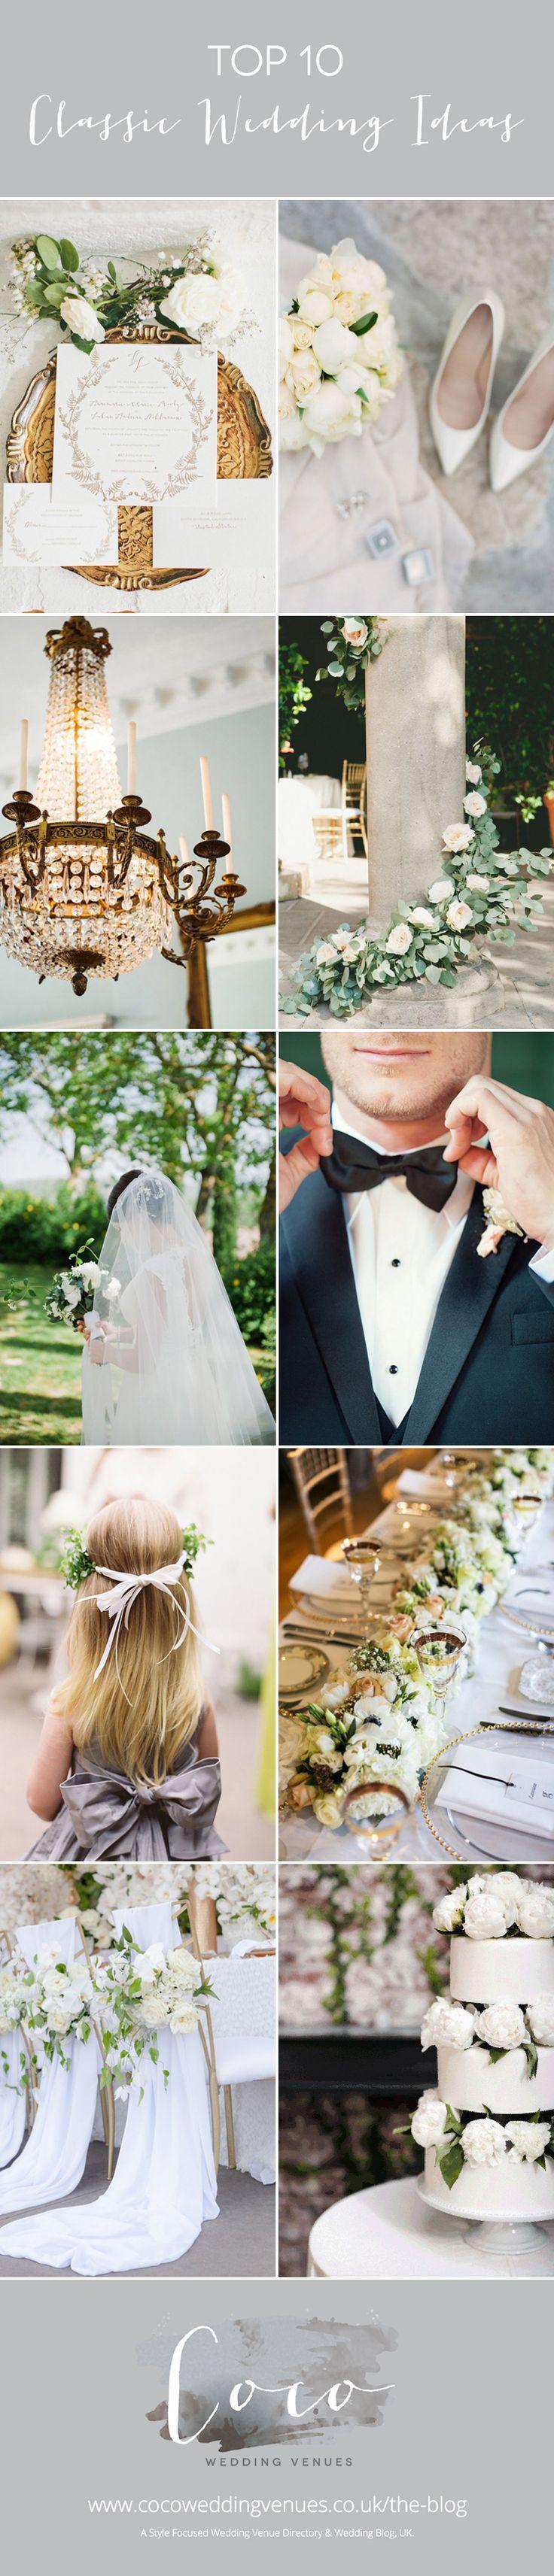 10 Classic Elegance Wedding Styling Tips